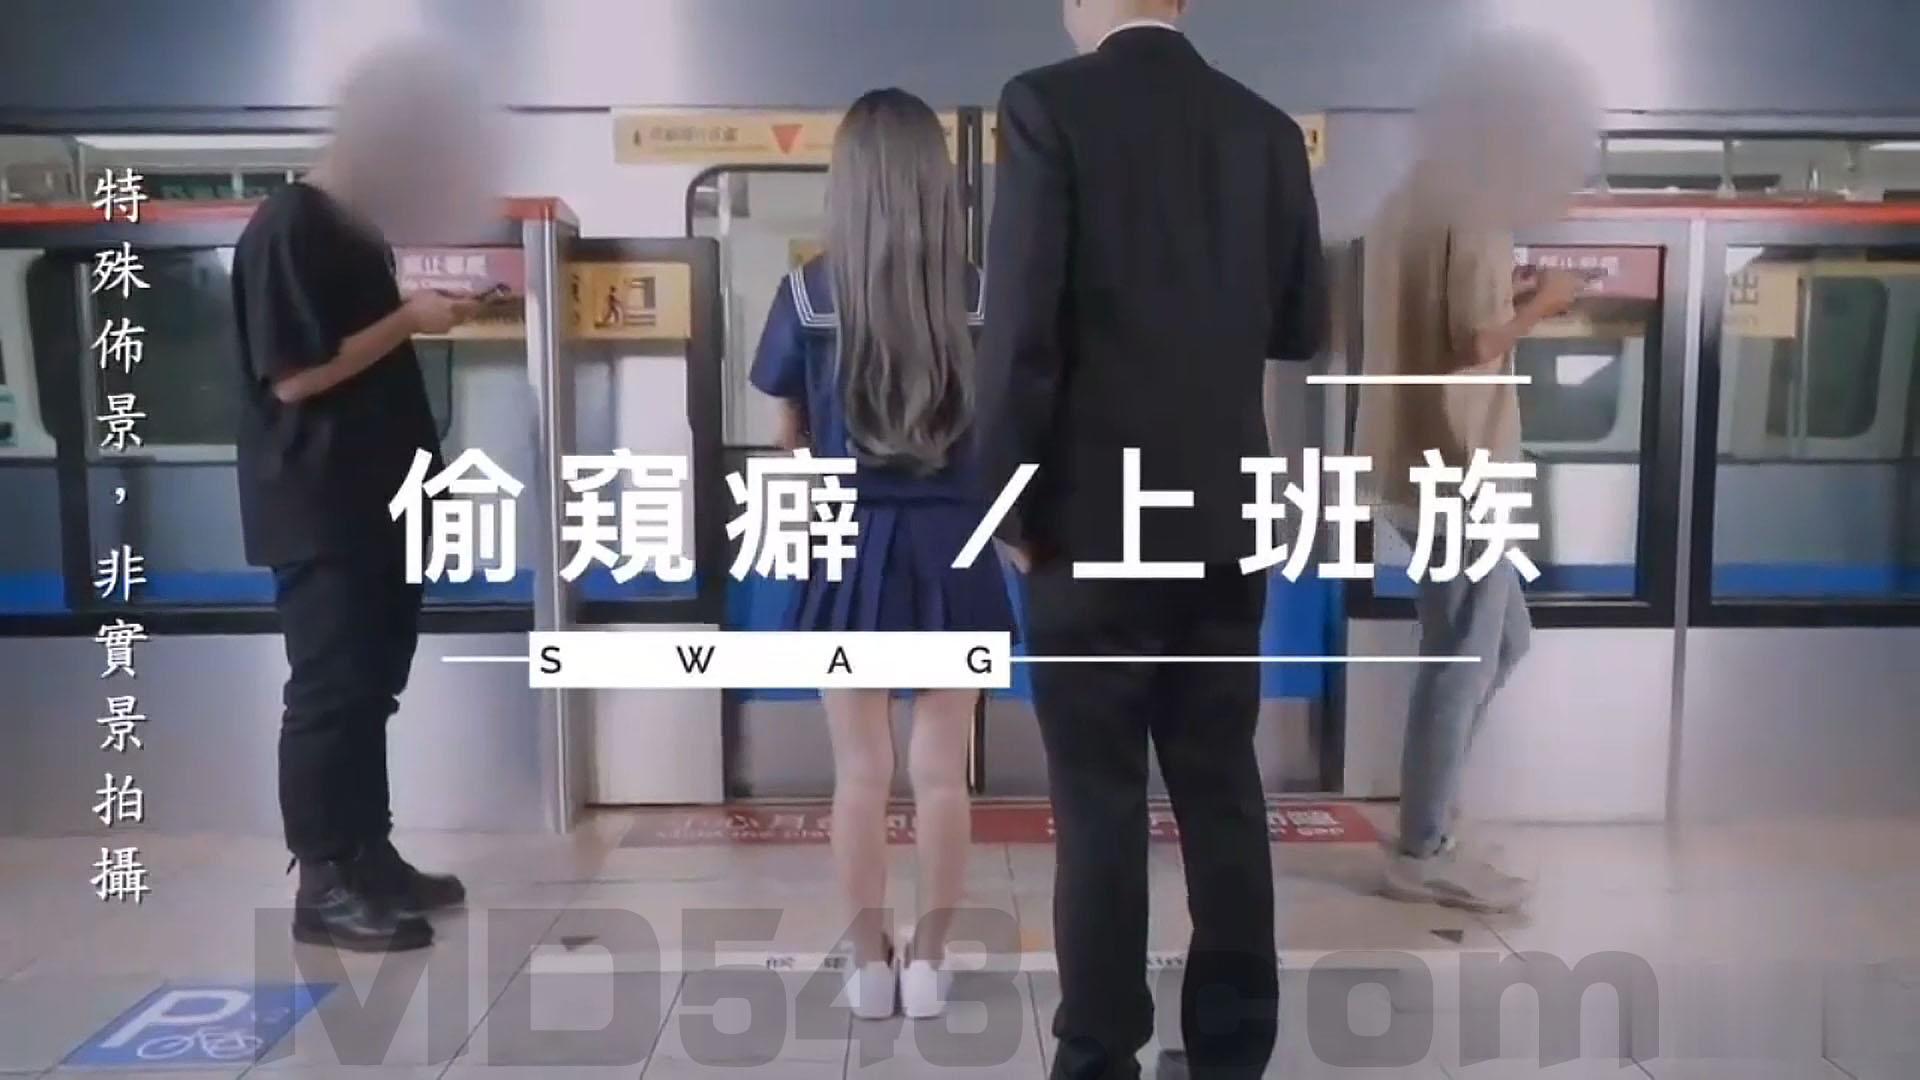 SWAG疑似在台X捷運拍片系列 捷運車廂之偷歸癖上班族